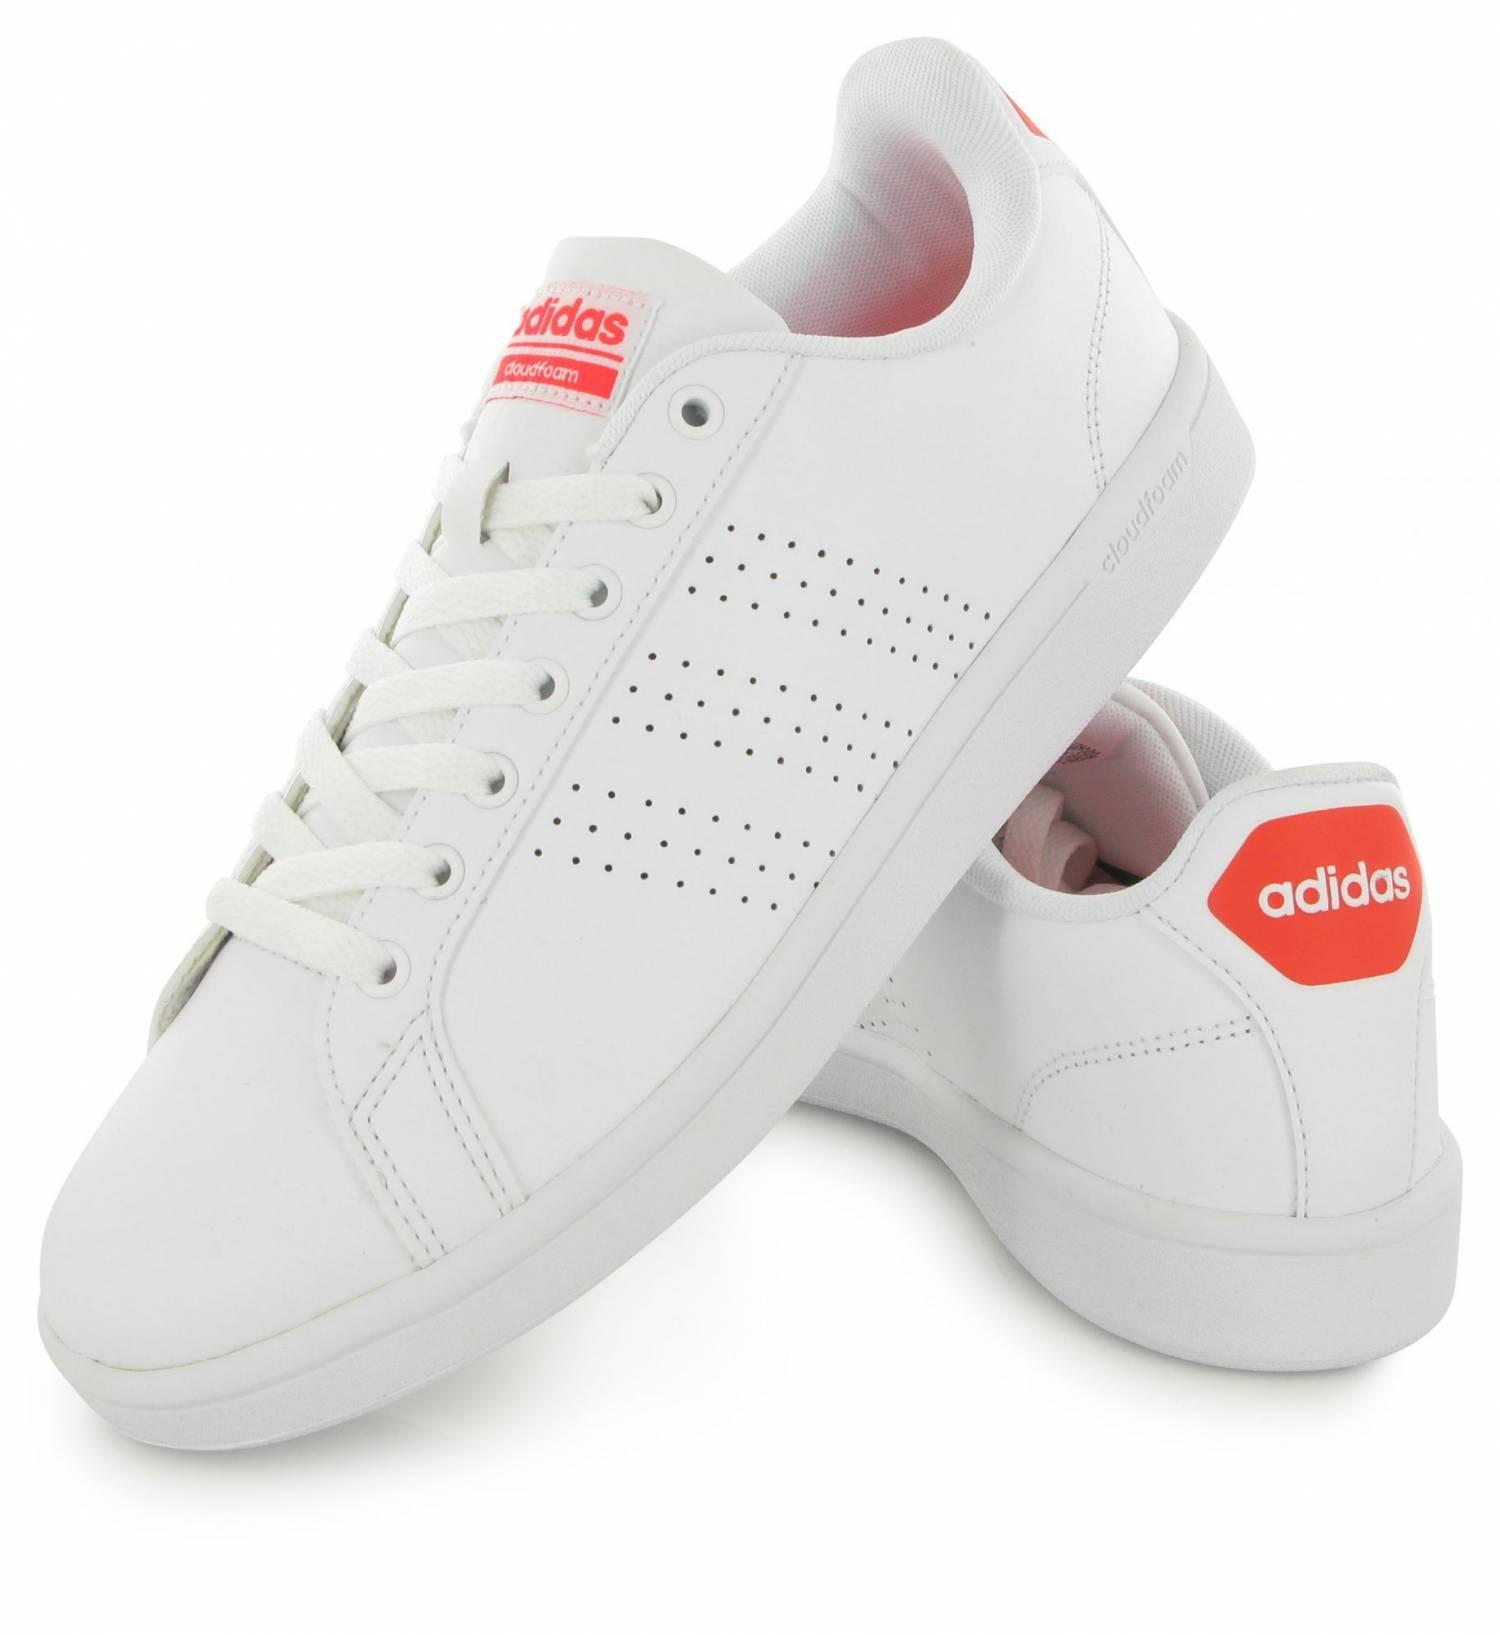 Adidas Neo Cloudfoam Advantage Blanc & Rouge Sol